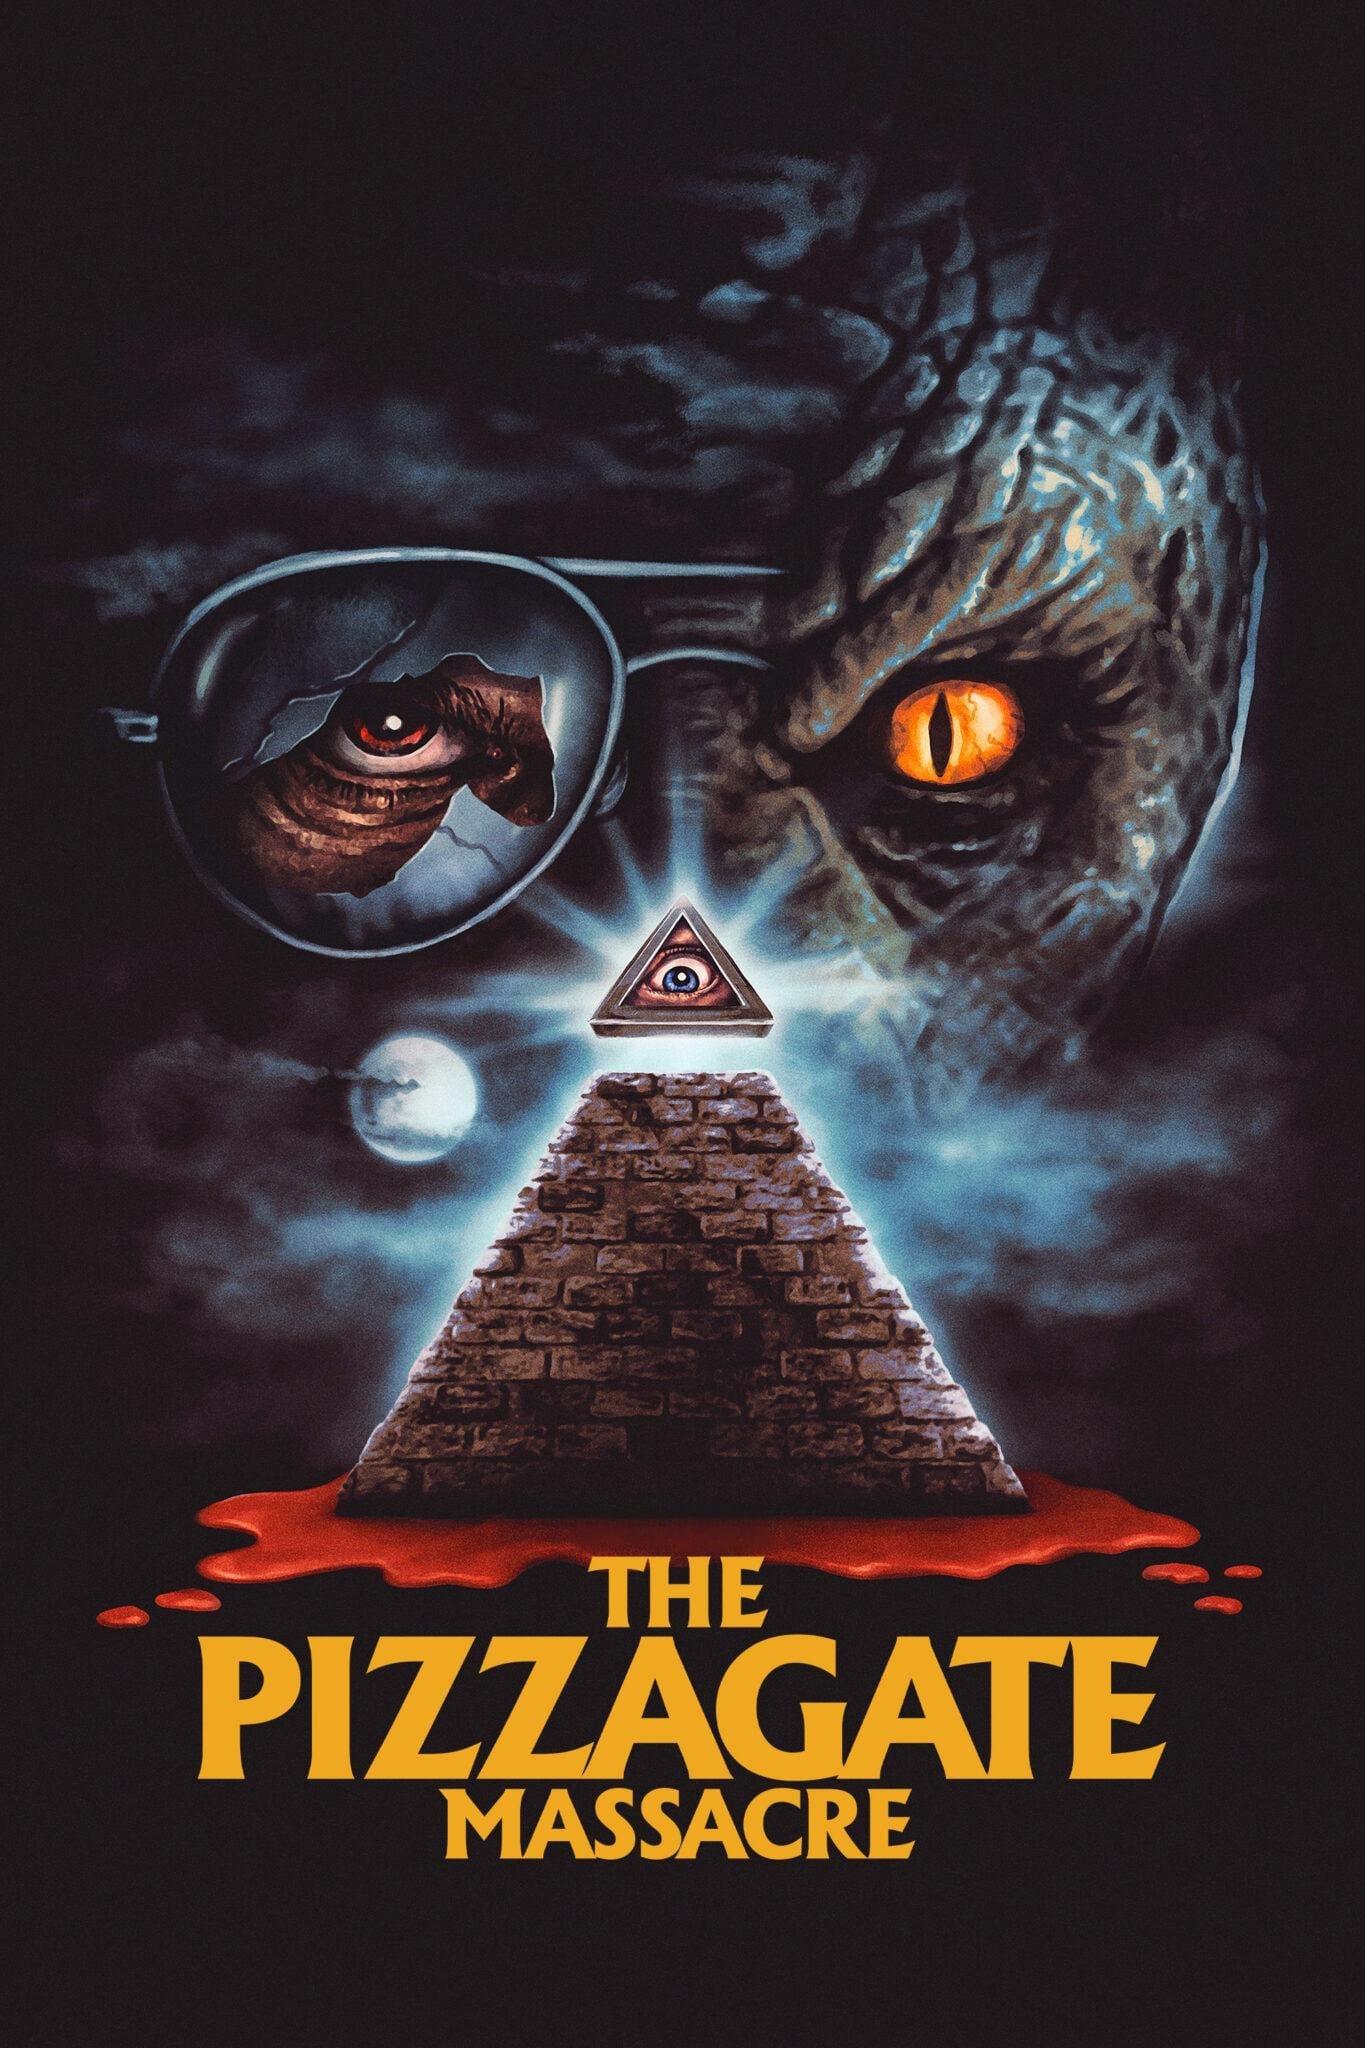 The Pizzagate Massacre